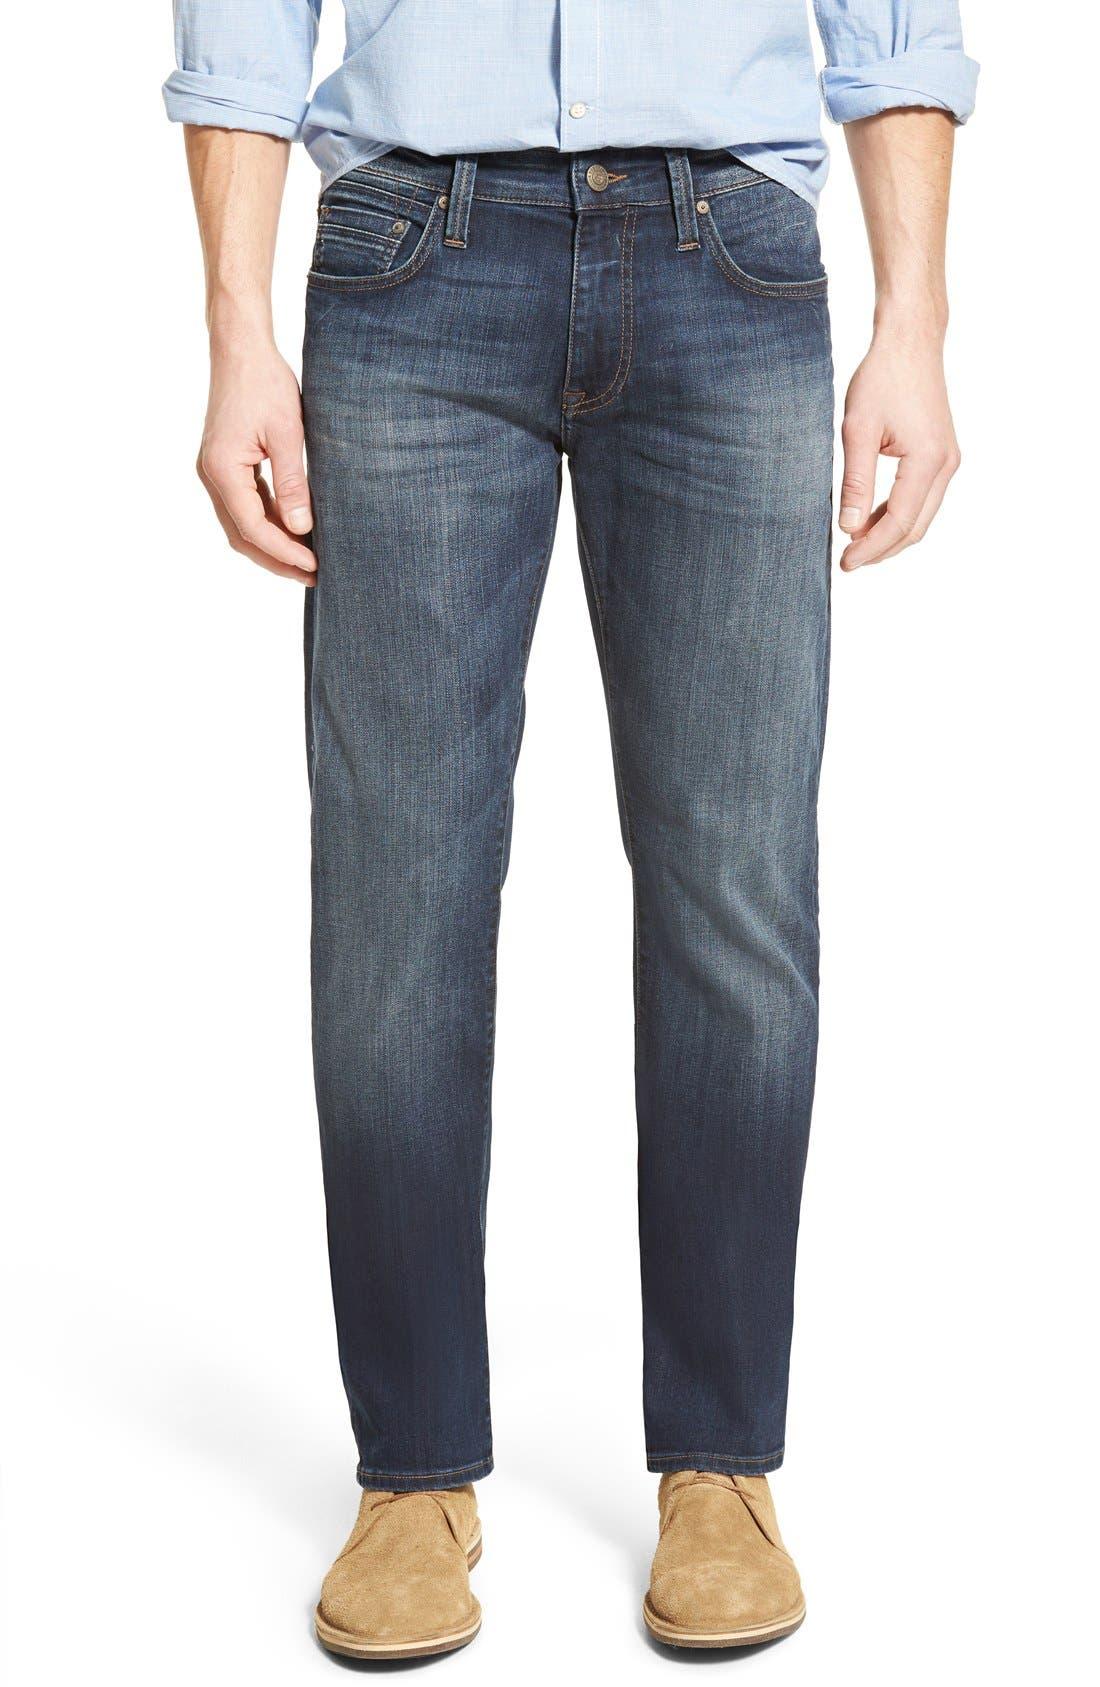 Zach Straight Leg Jeans,                             Main thumbnail 1, color,                             DARK BRUSHED WILLIAMSBURG